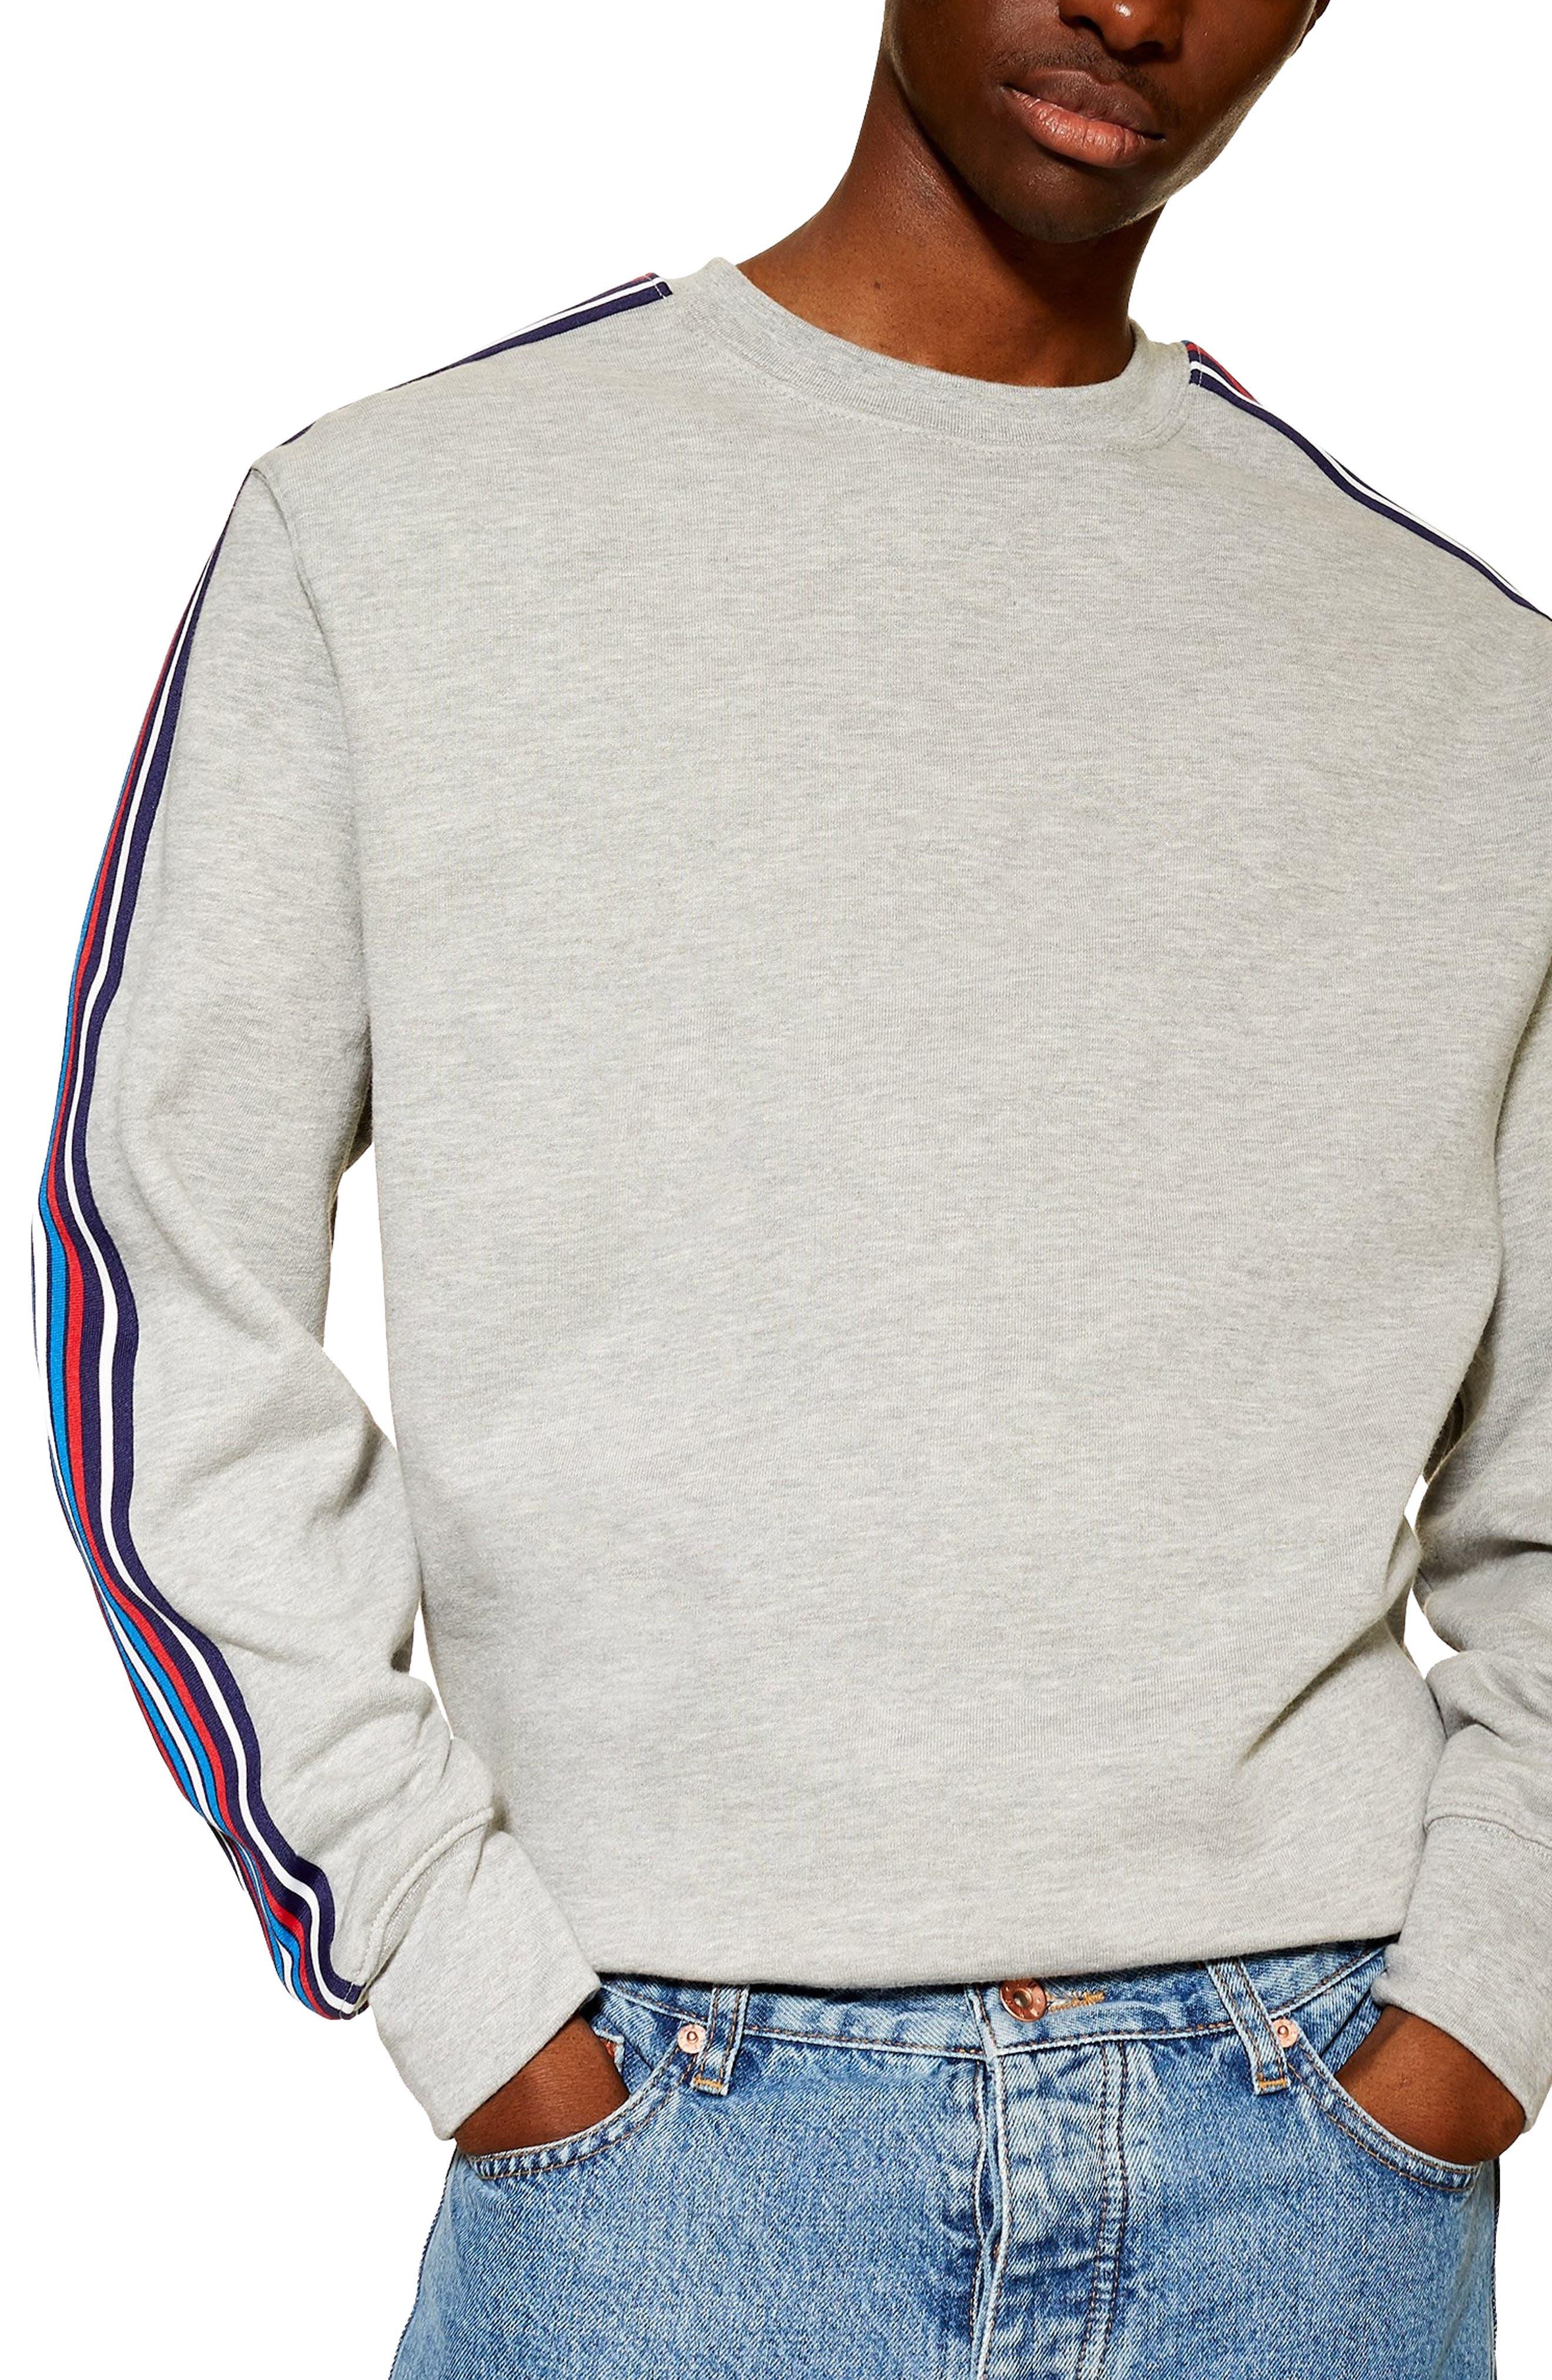 Tape Crewneck Sweatshirt, Main, color, 050